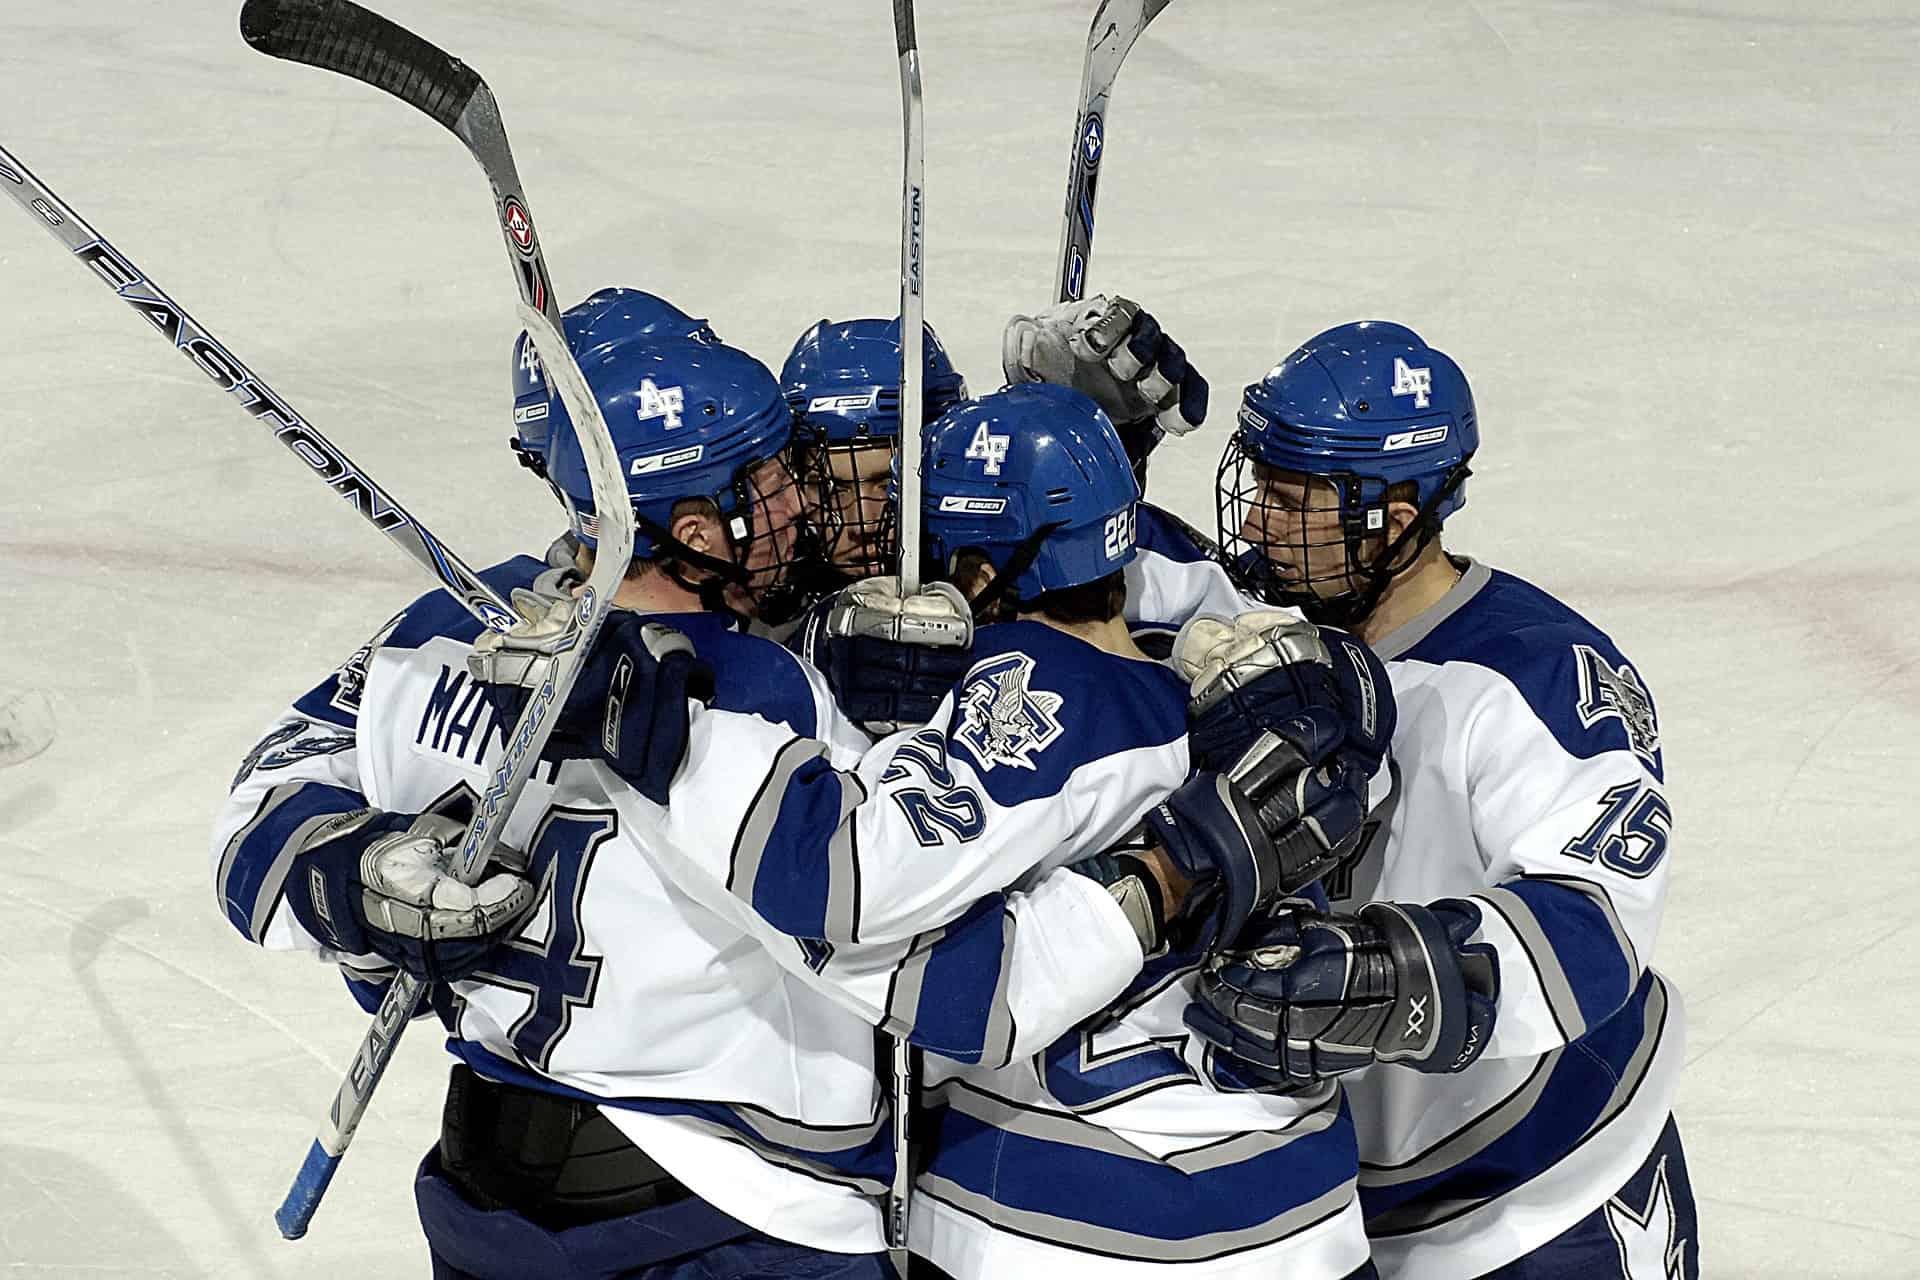 Ice Hokey Coach und Team